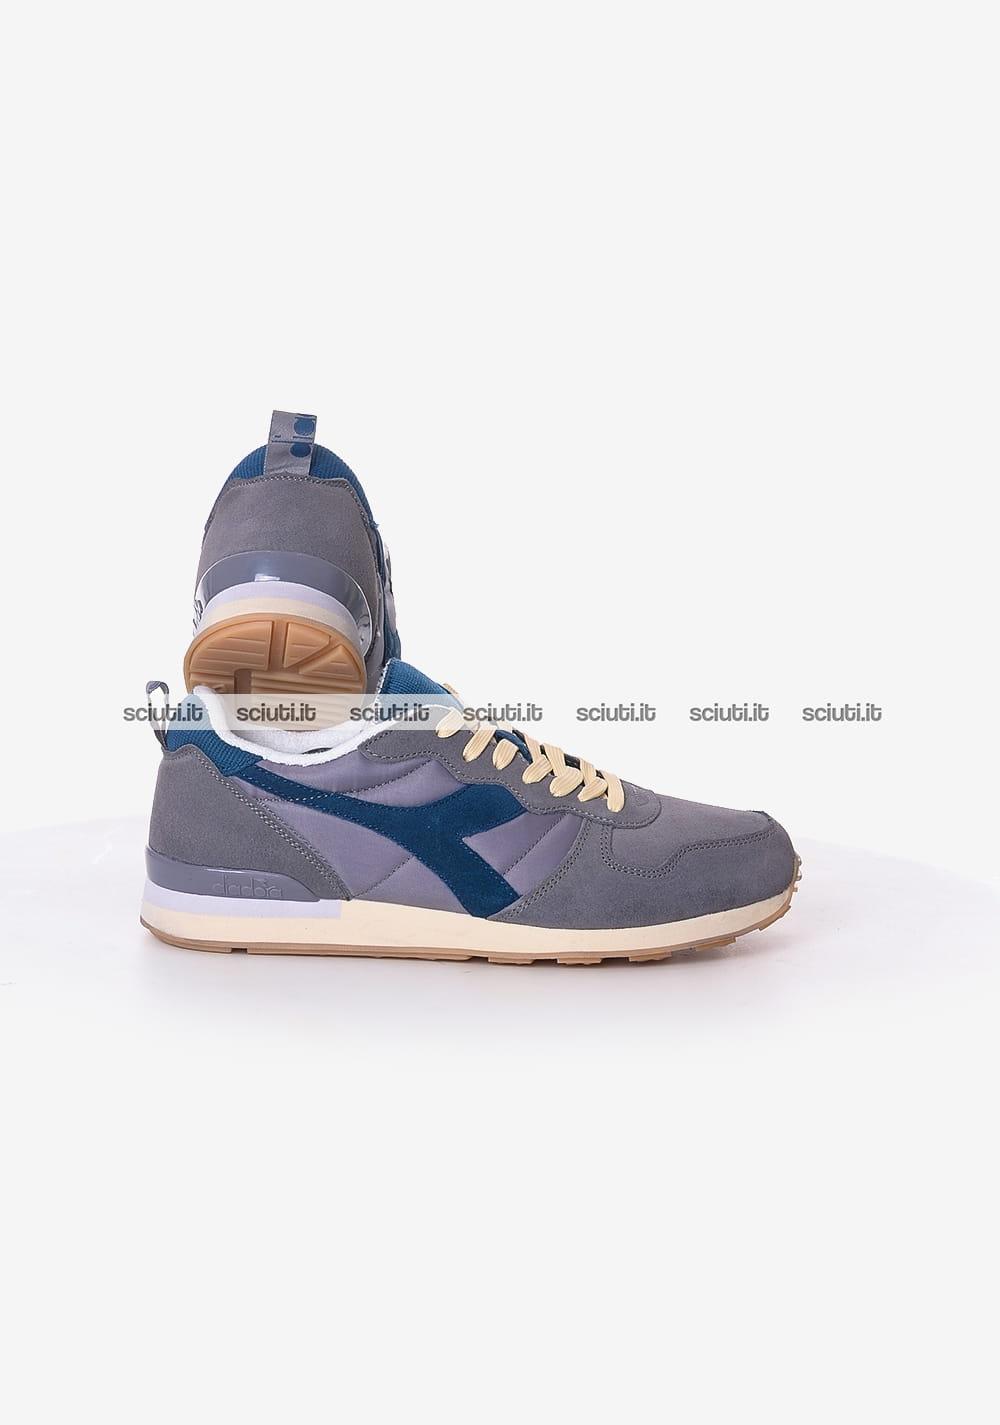 Scarpe Diadora uomo Camaro Used grigio blu